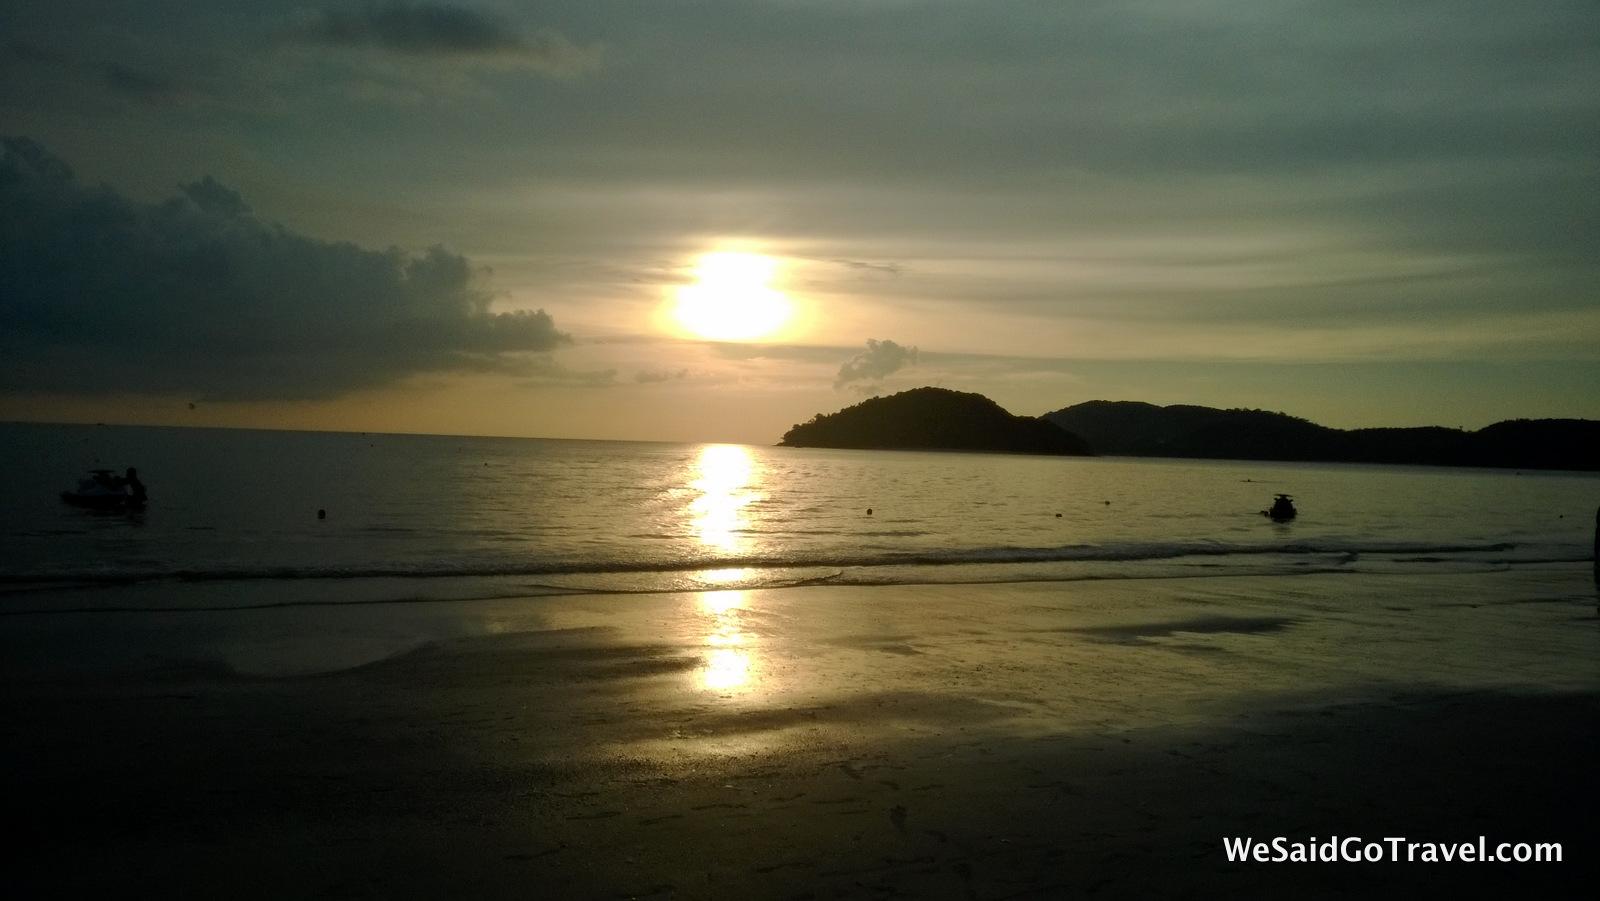 Cenang Beach, Langkawi, Malaysia 2013